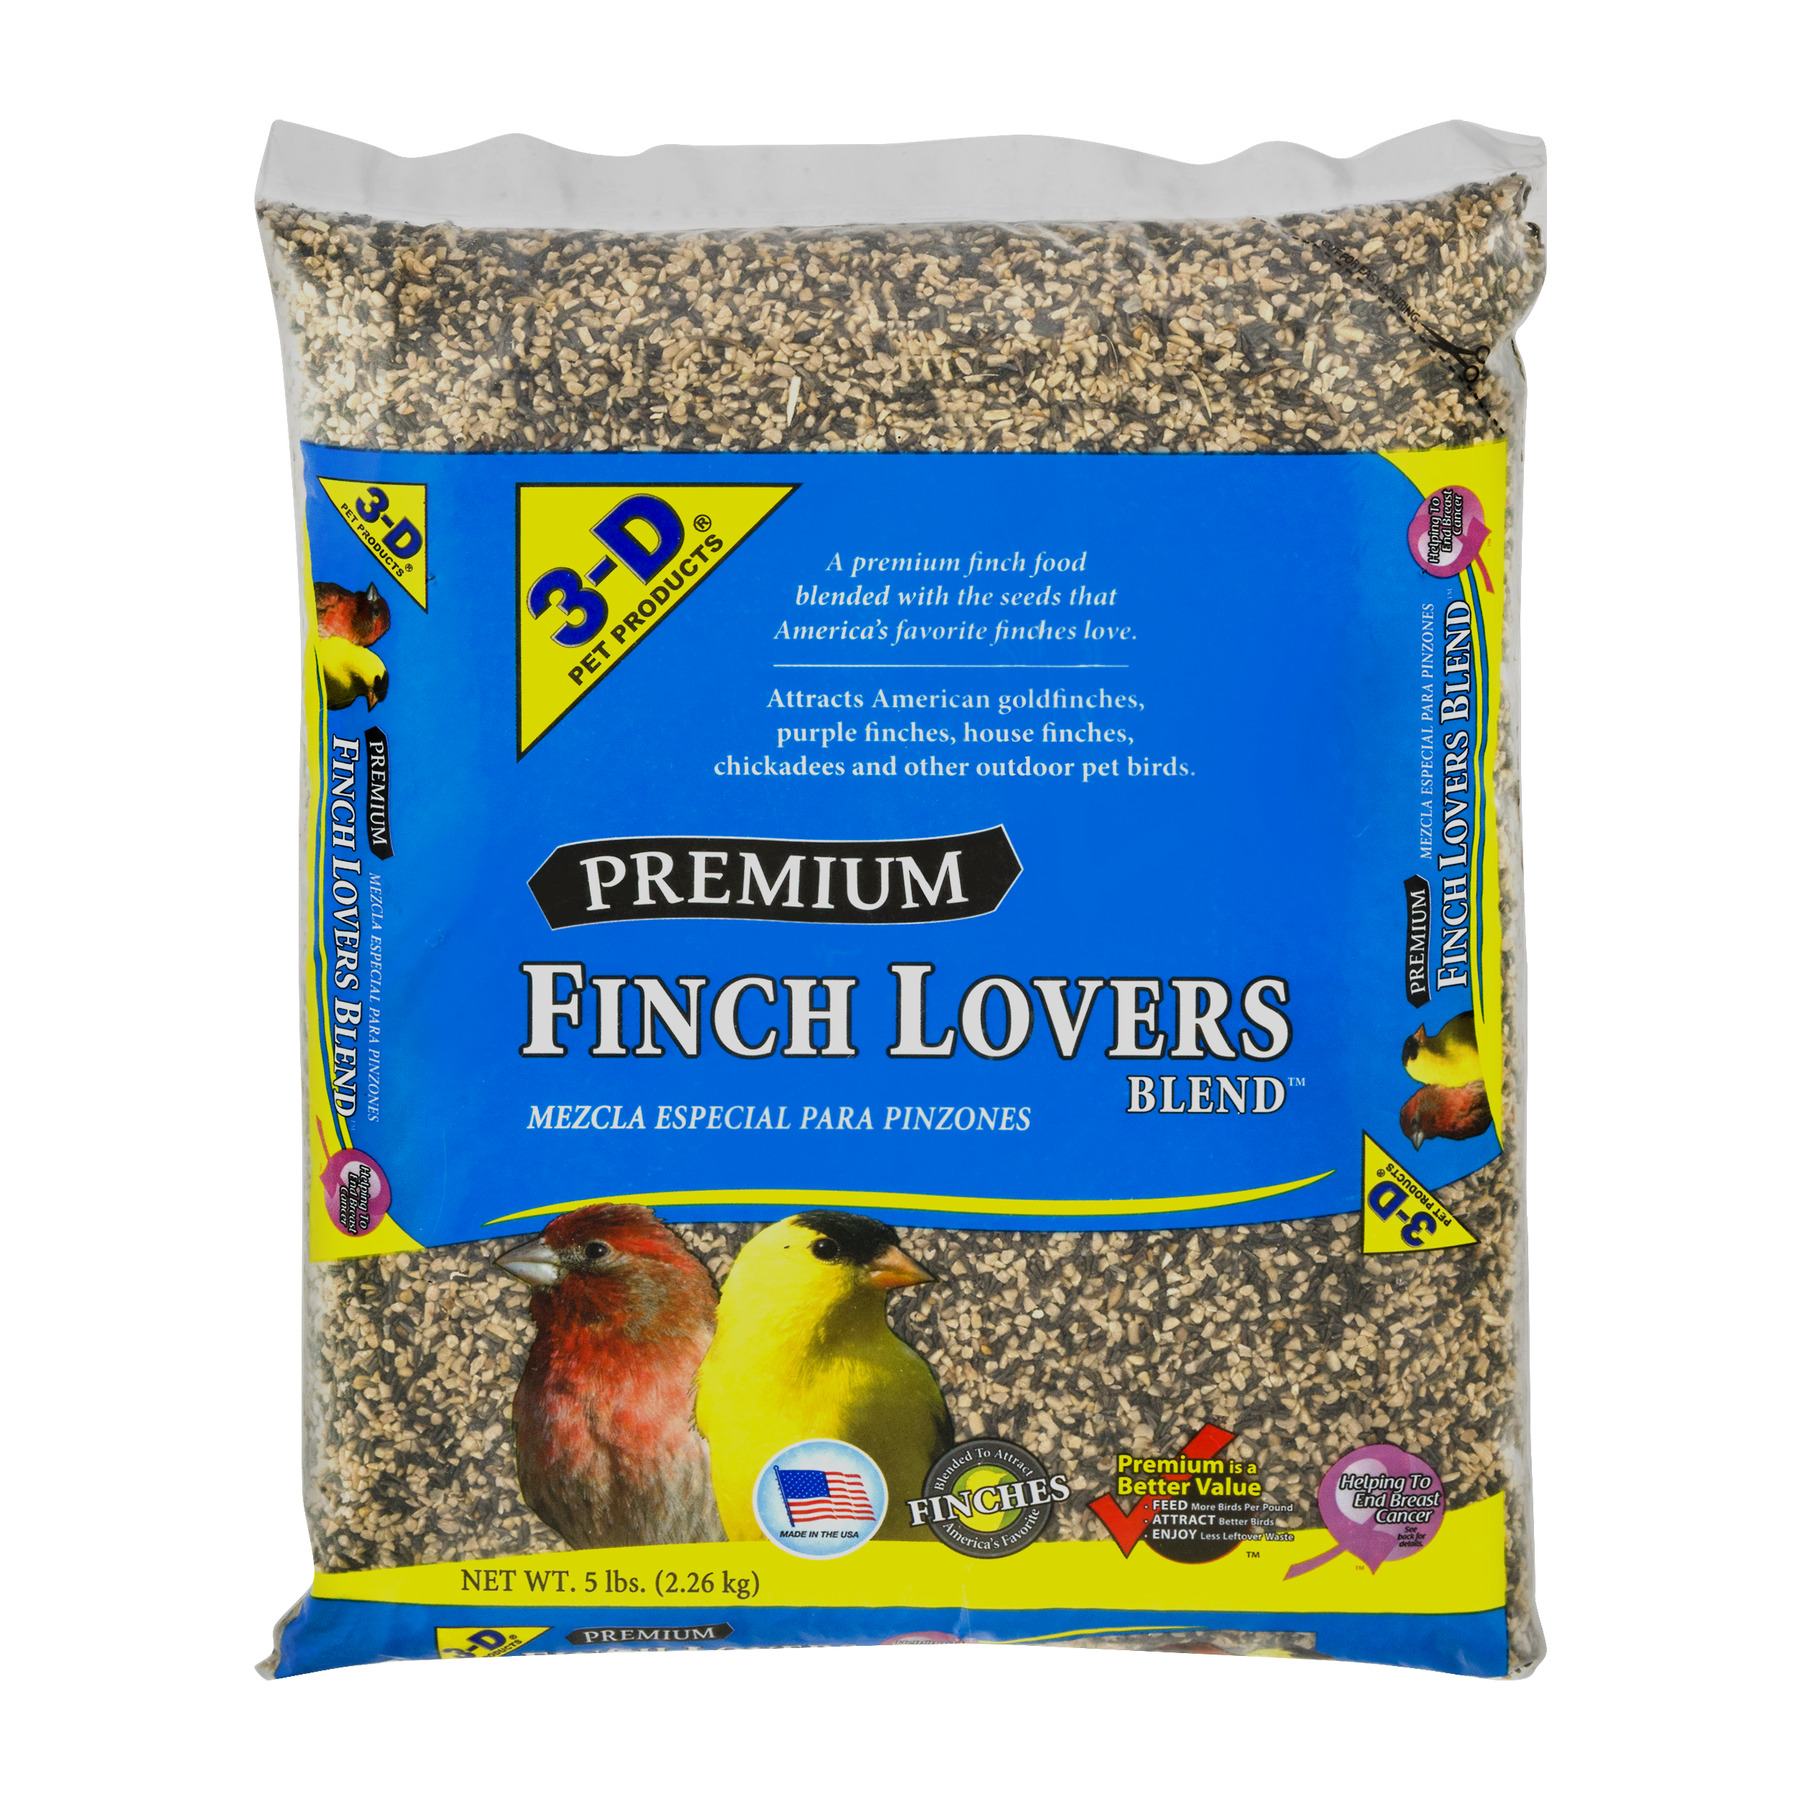 3-D Pet Products Premium Finch Lovers Blend Dry Parrot Food, 5 LB by D & D Commodities Ltd.